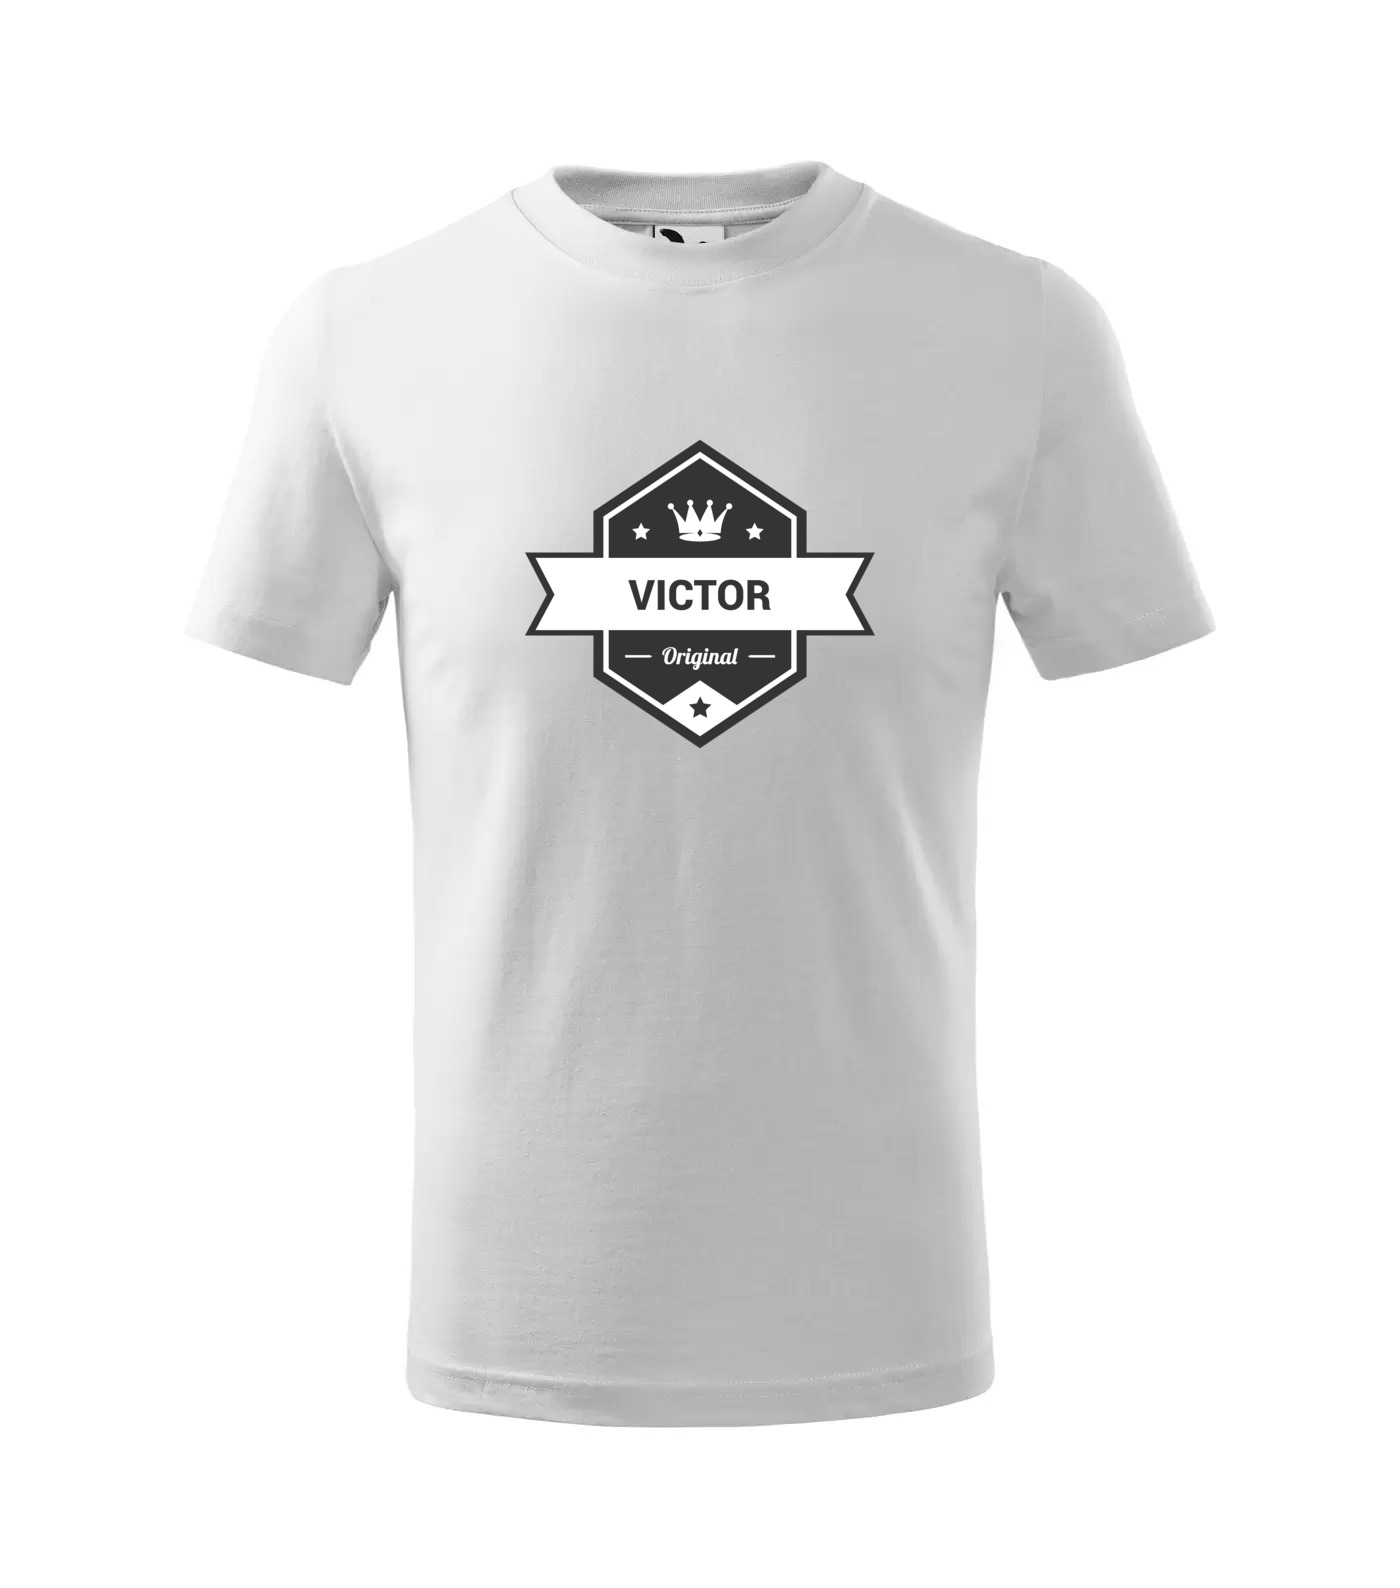 Tričko King Victor